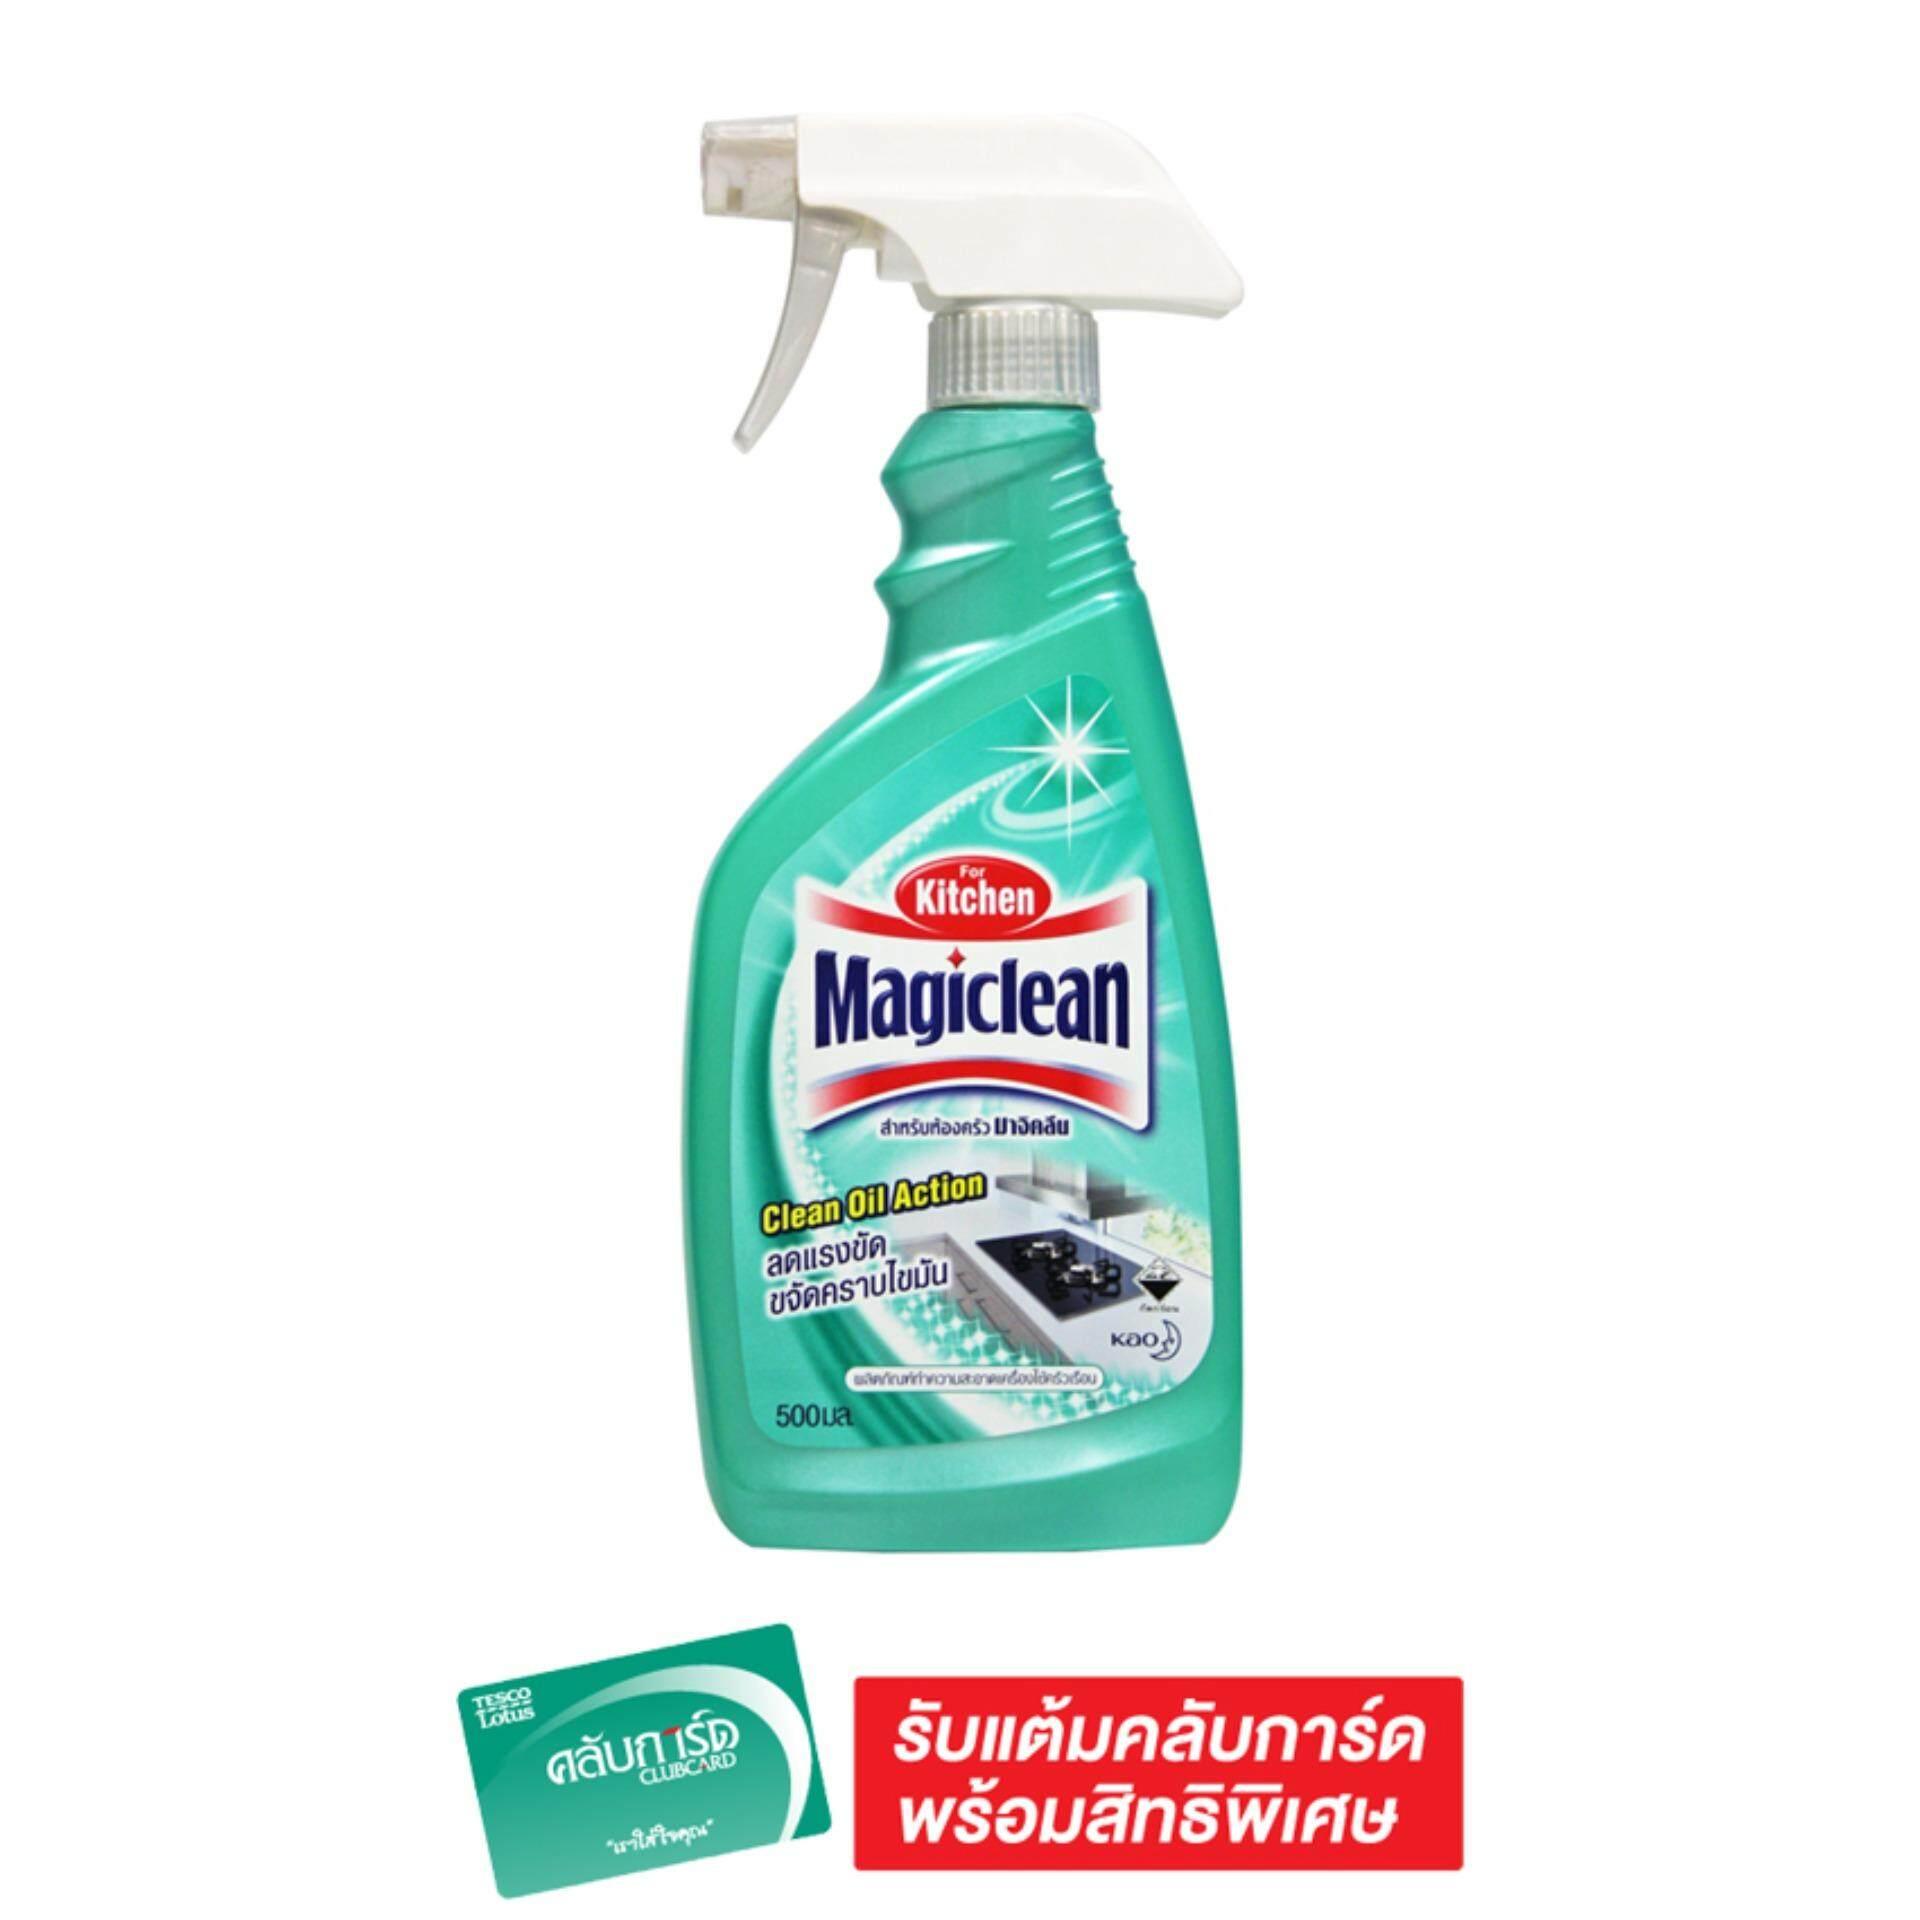 Magiclean มาจิคลีน น้ำยาทำความสะอาดครัว ขวดสเปรย์ 500 มล. By Tesco Supermarket.